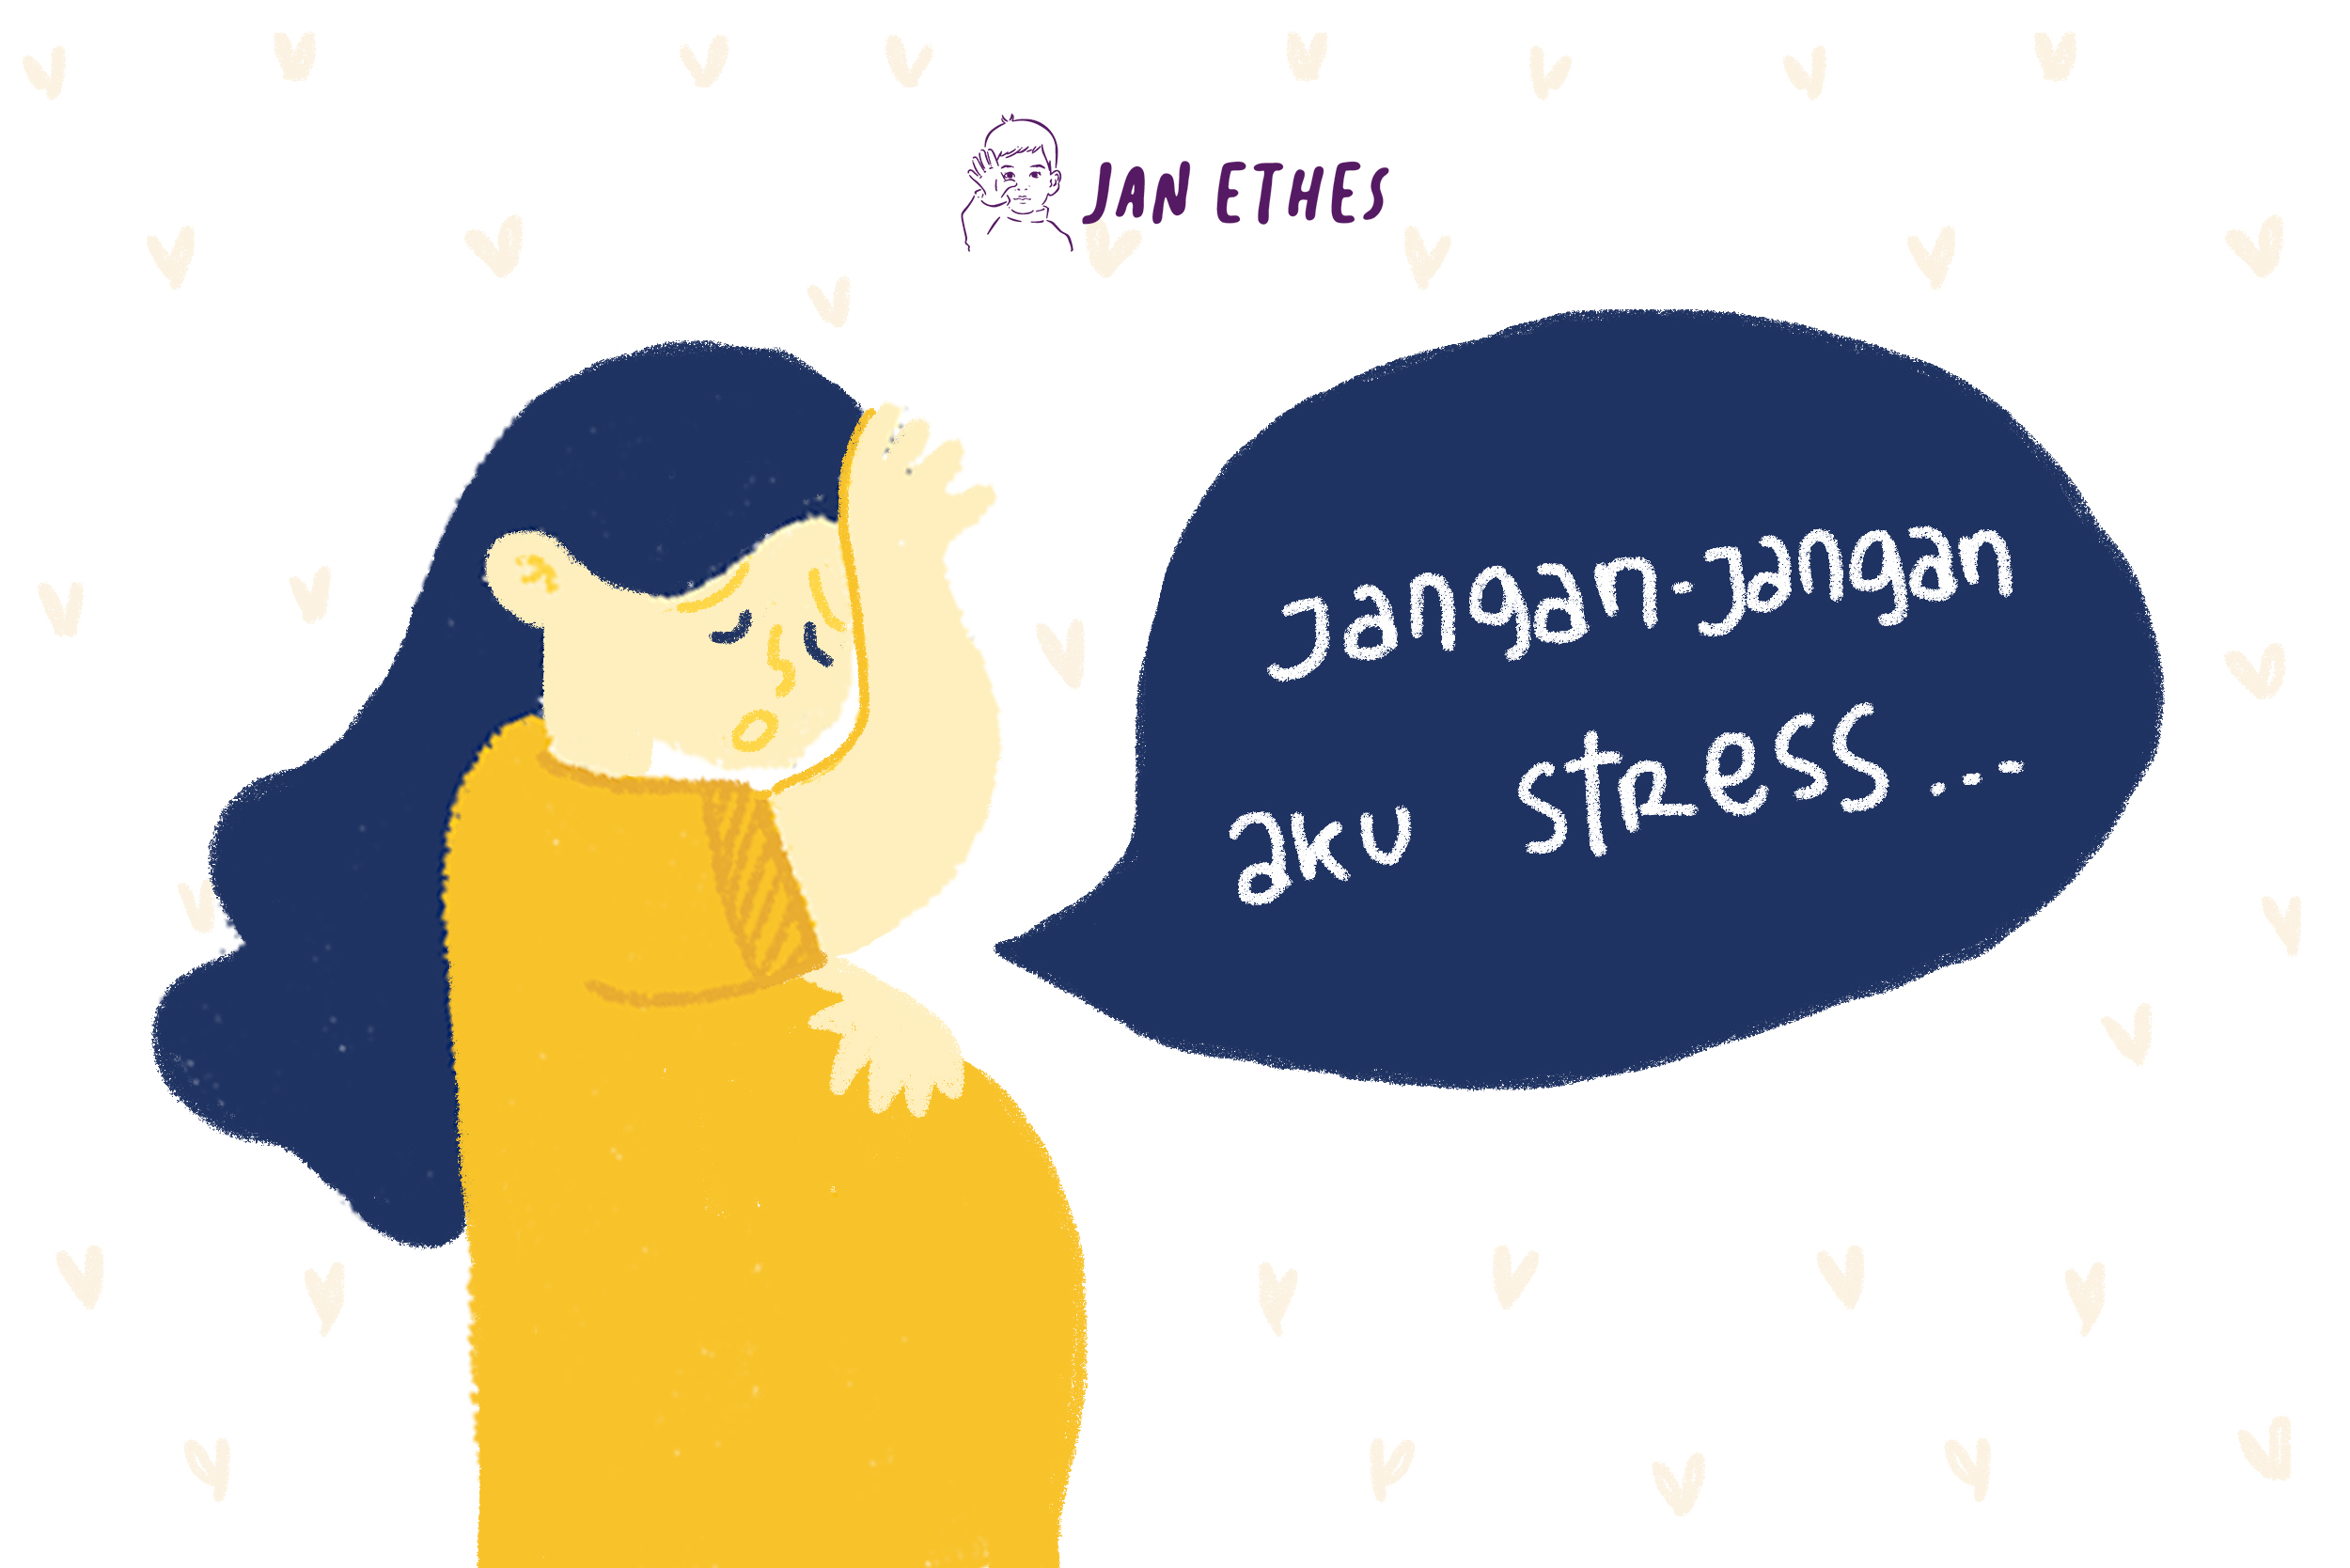 Ini Gejala Ibu Hamil Mengalami Depresi, Jangan Sepelekan!depresi ibu hamil,